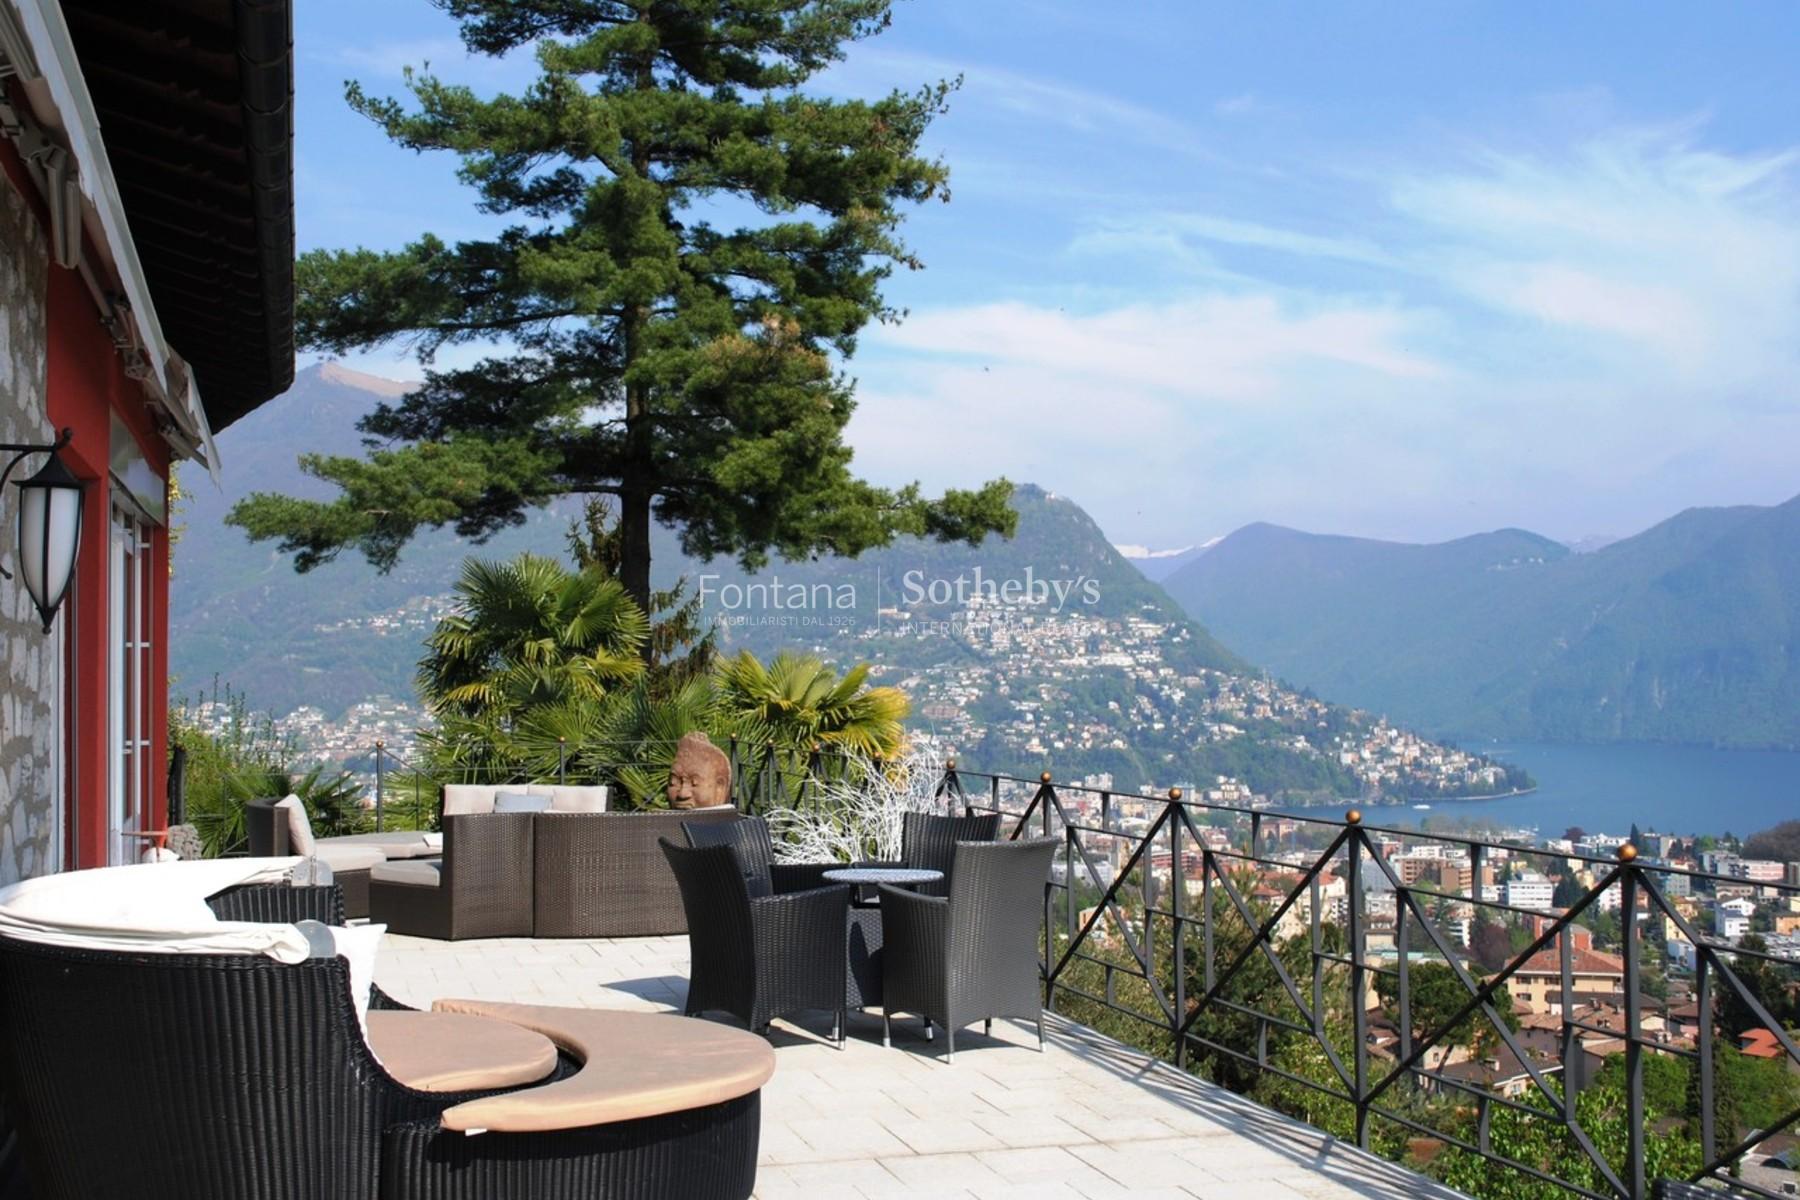 Single Family Home for Sale at Beautiful mediterranean villa with panoramic view Breganzona Breganzona, Ticino, 6932 Switzerland